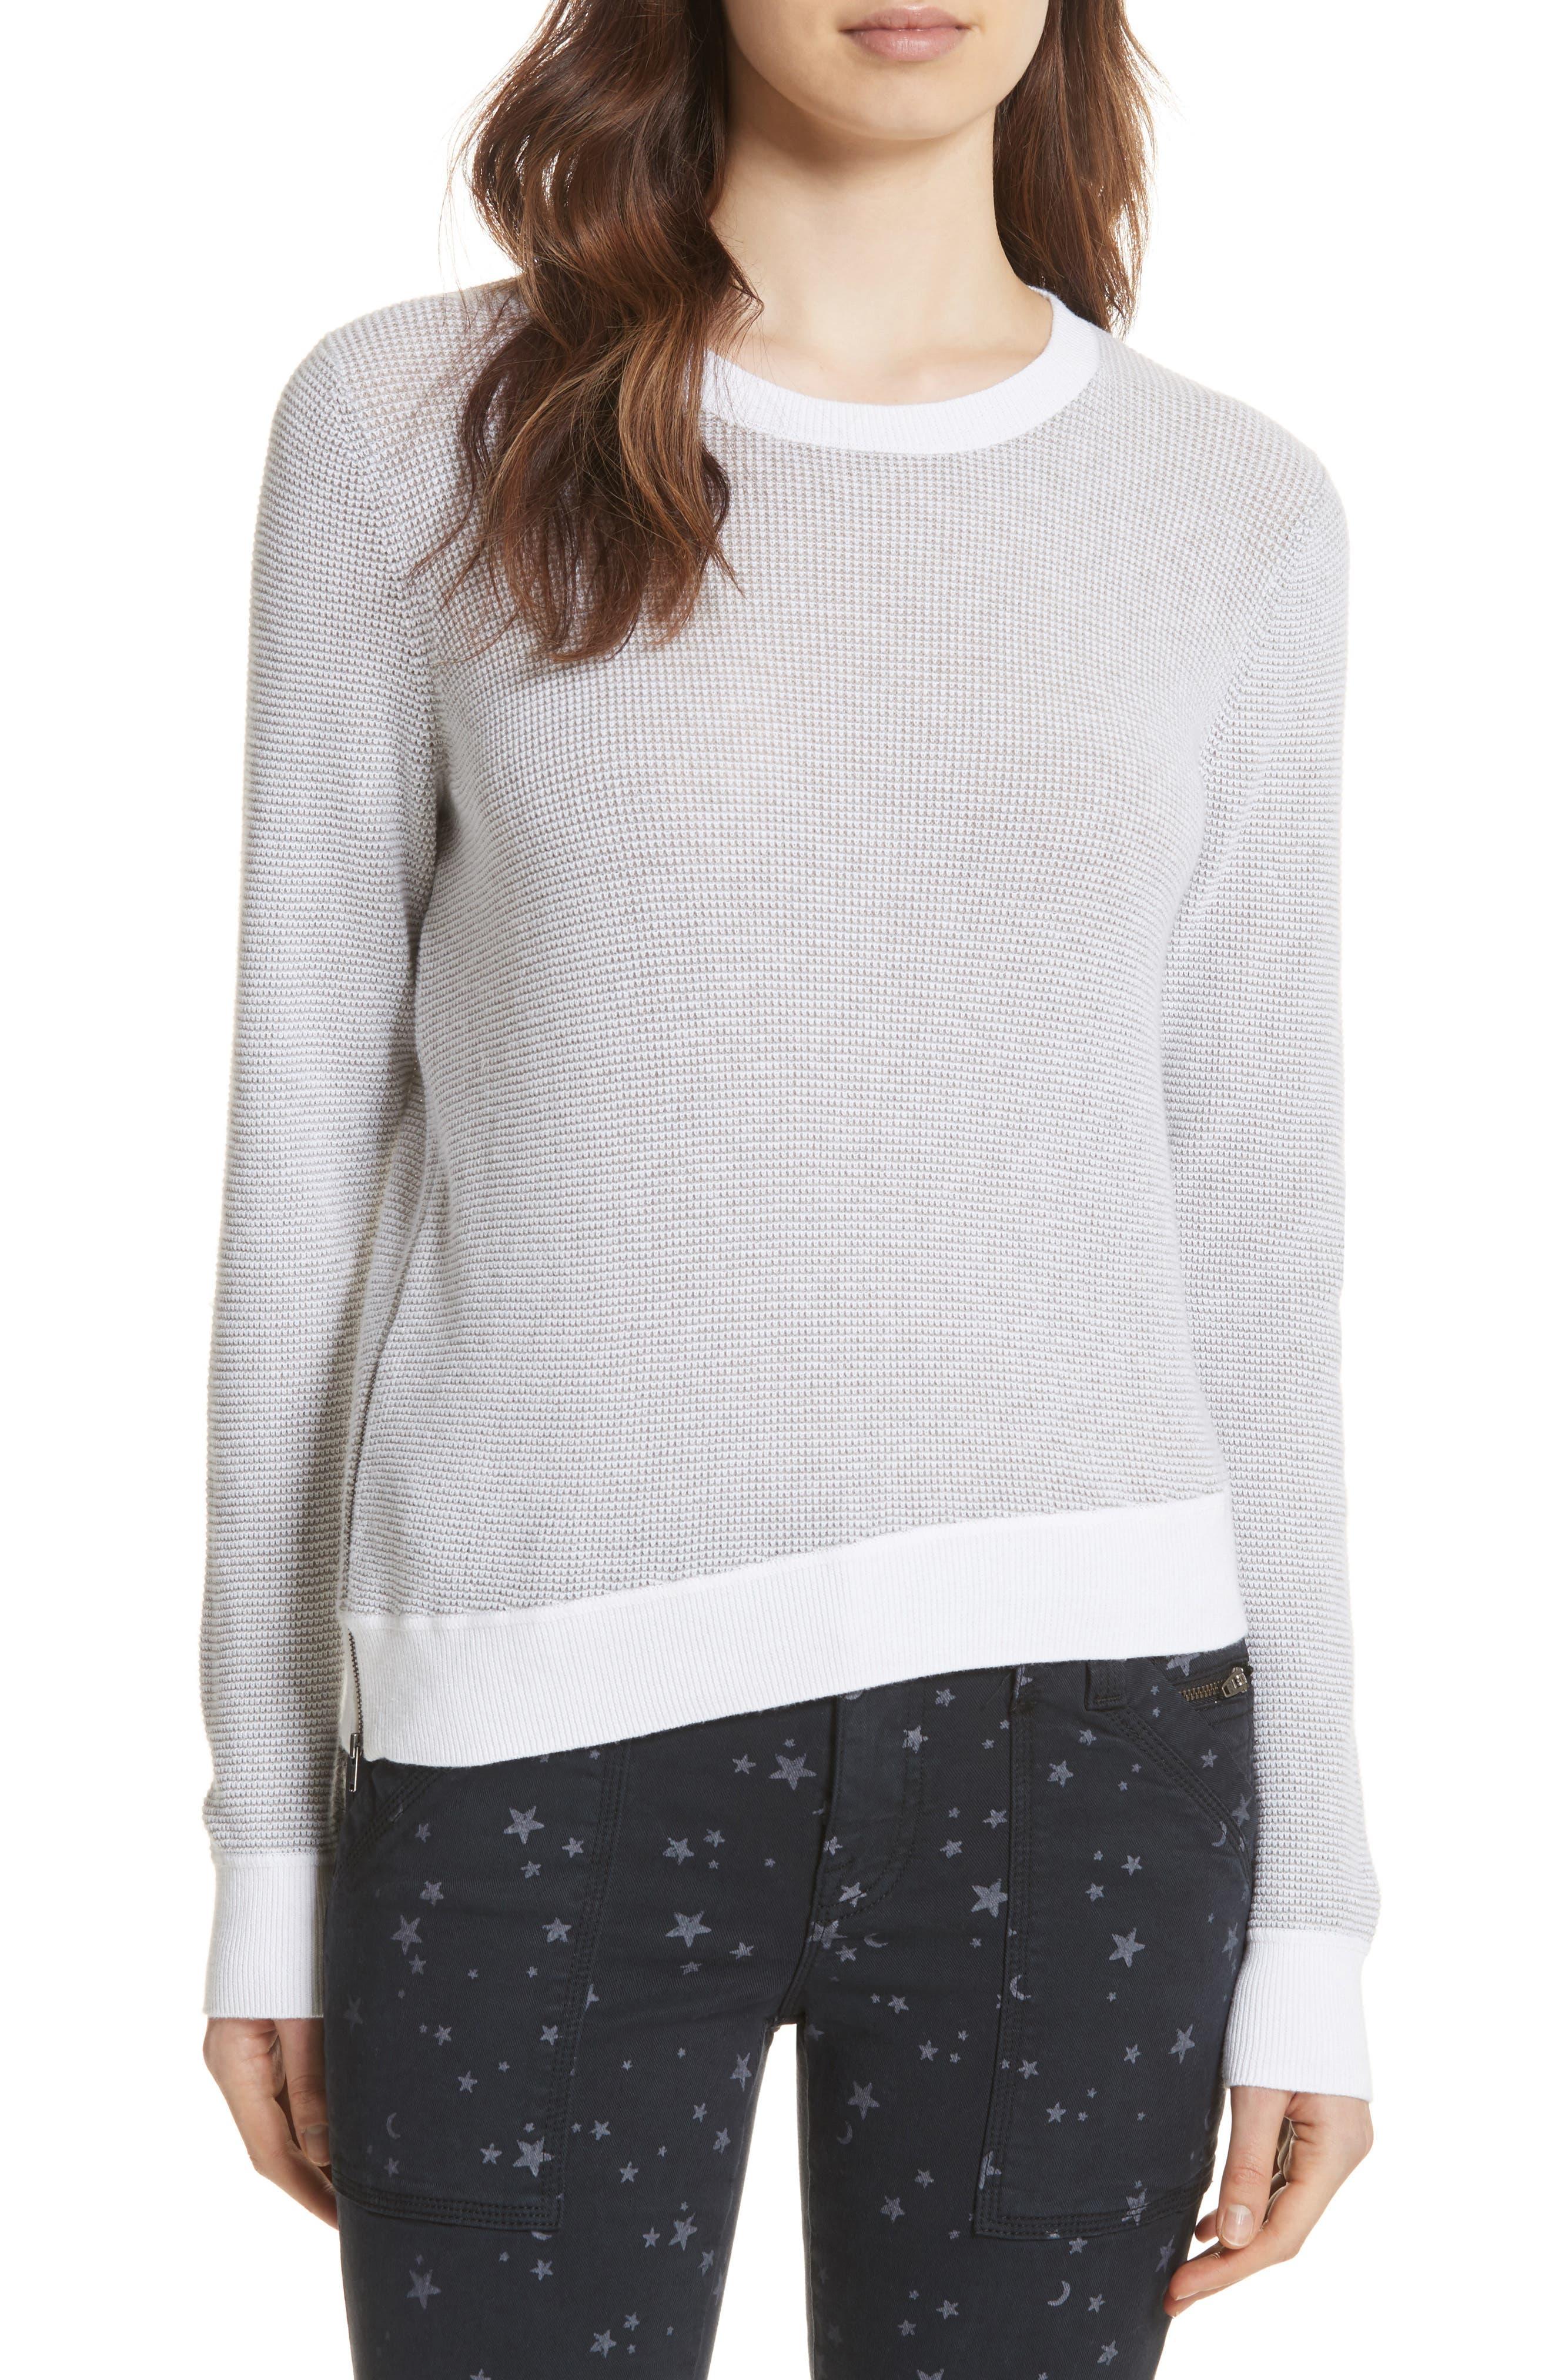 Laurana Cotton & Cashmere Sweater,                         Main,                         color, Porcelain/ Heather Grey